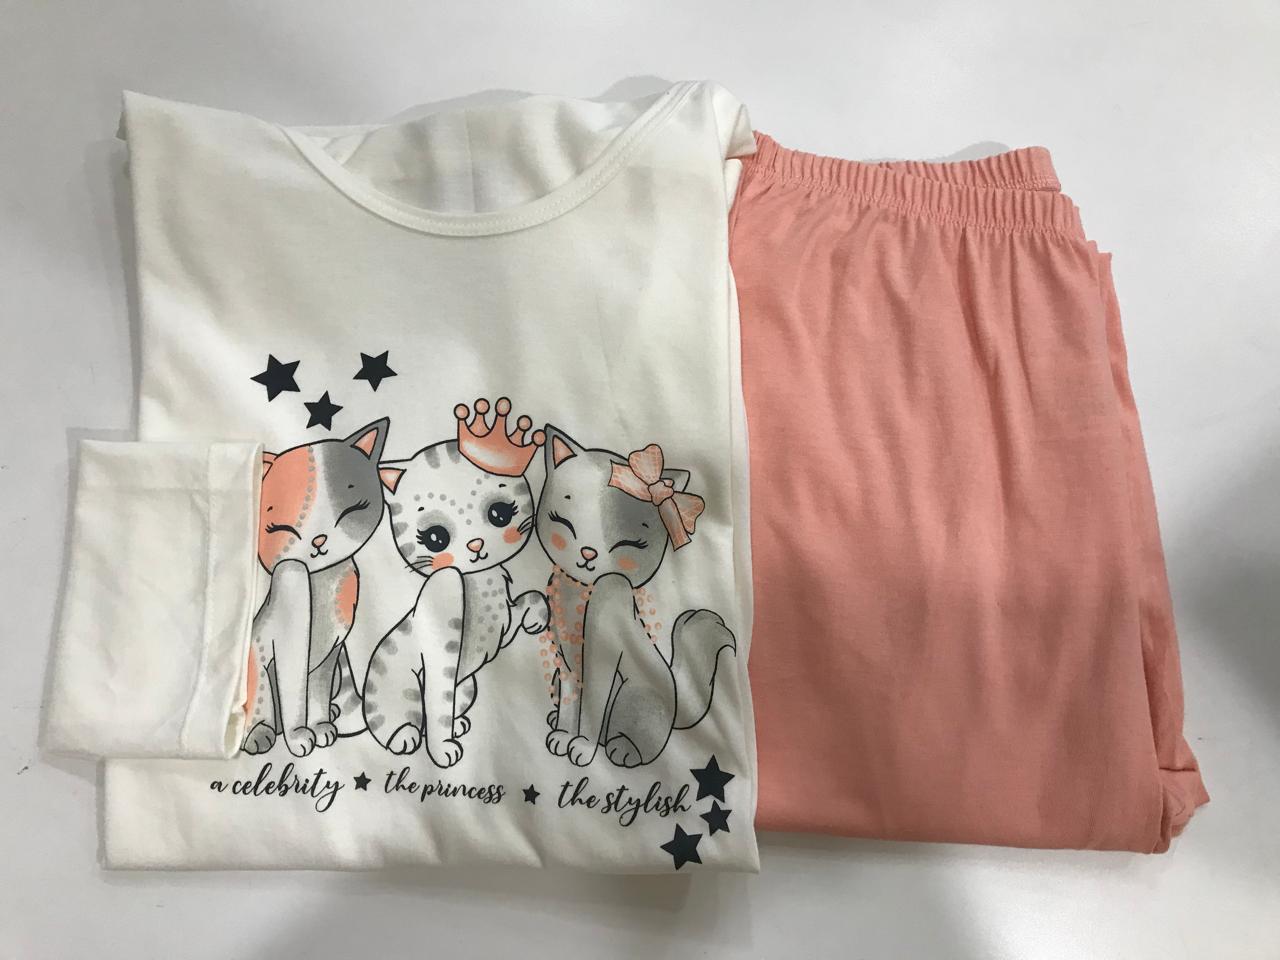 Pijama Feminino Adulto Lua Encantada Manga Longa  Cat salmon 346 em 100% algodão